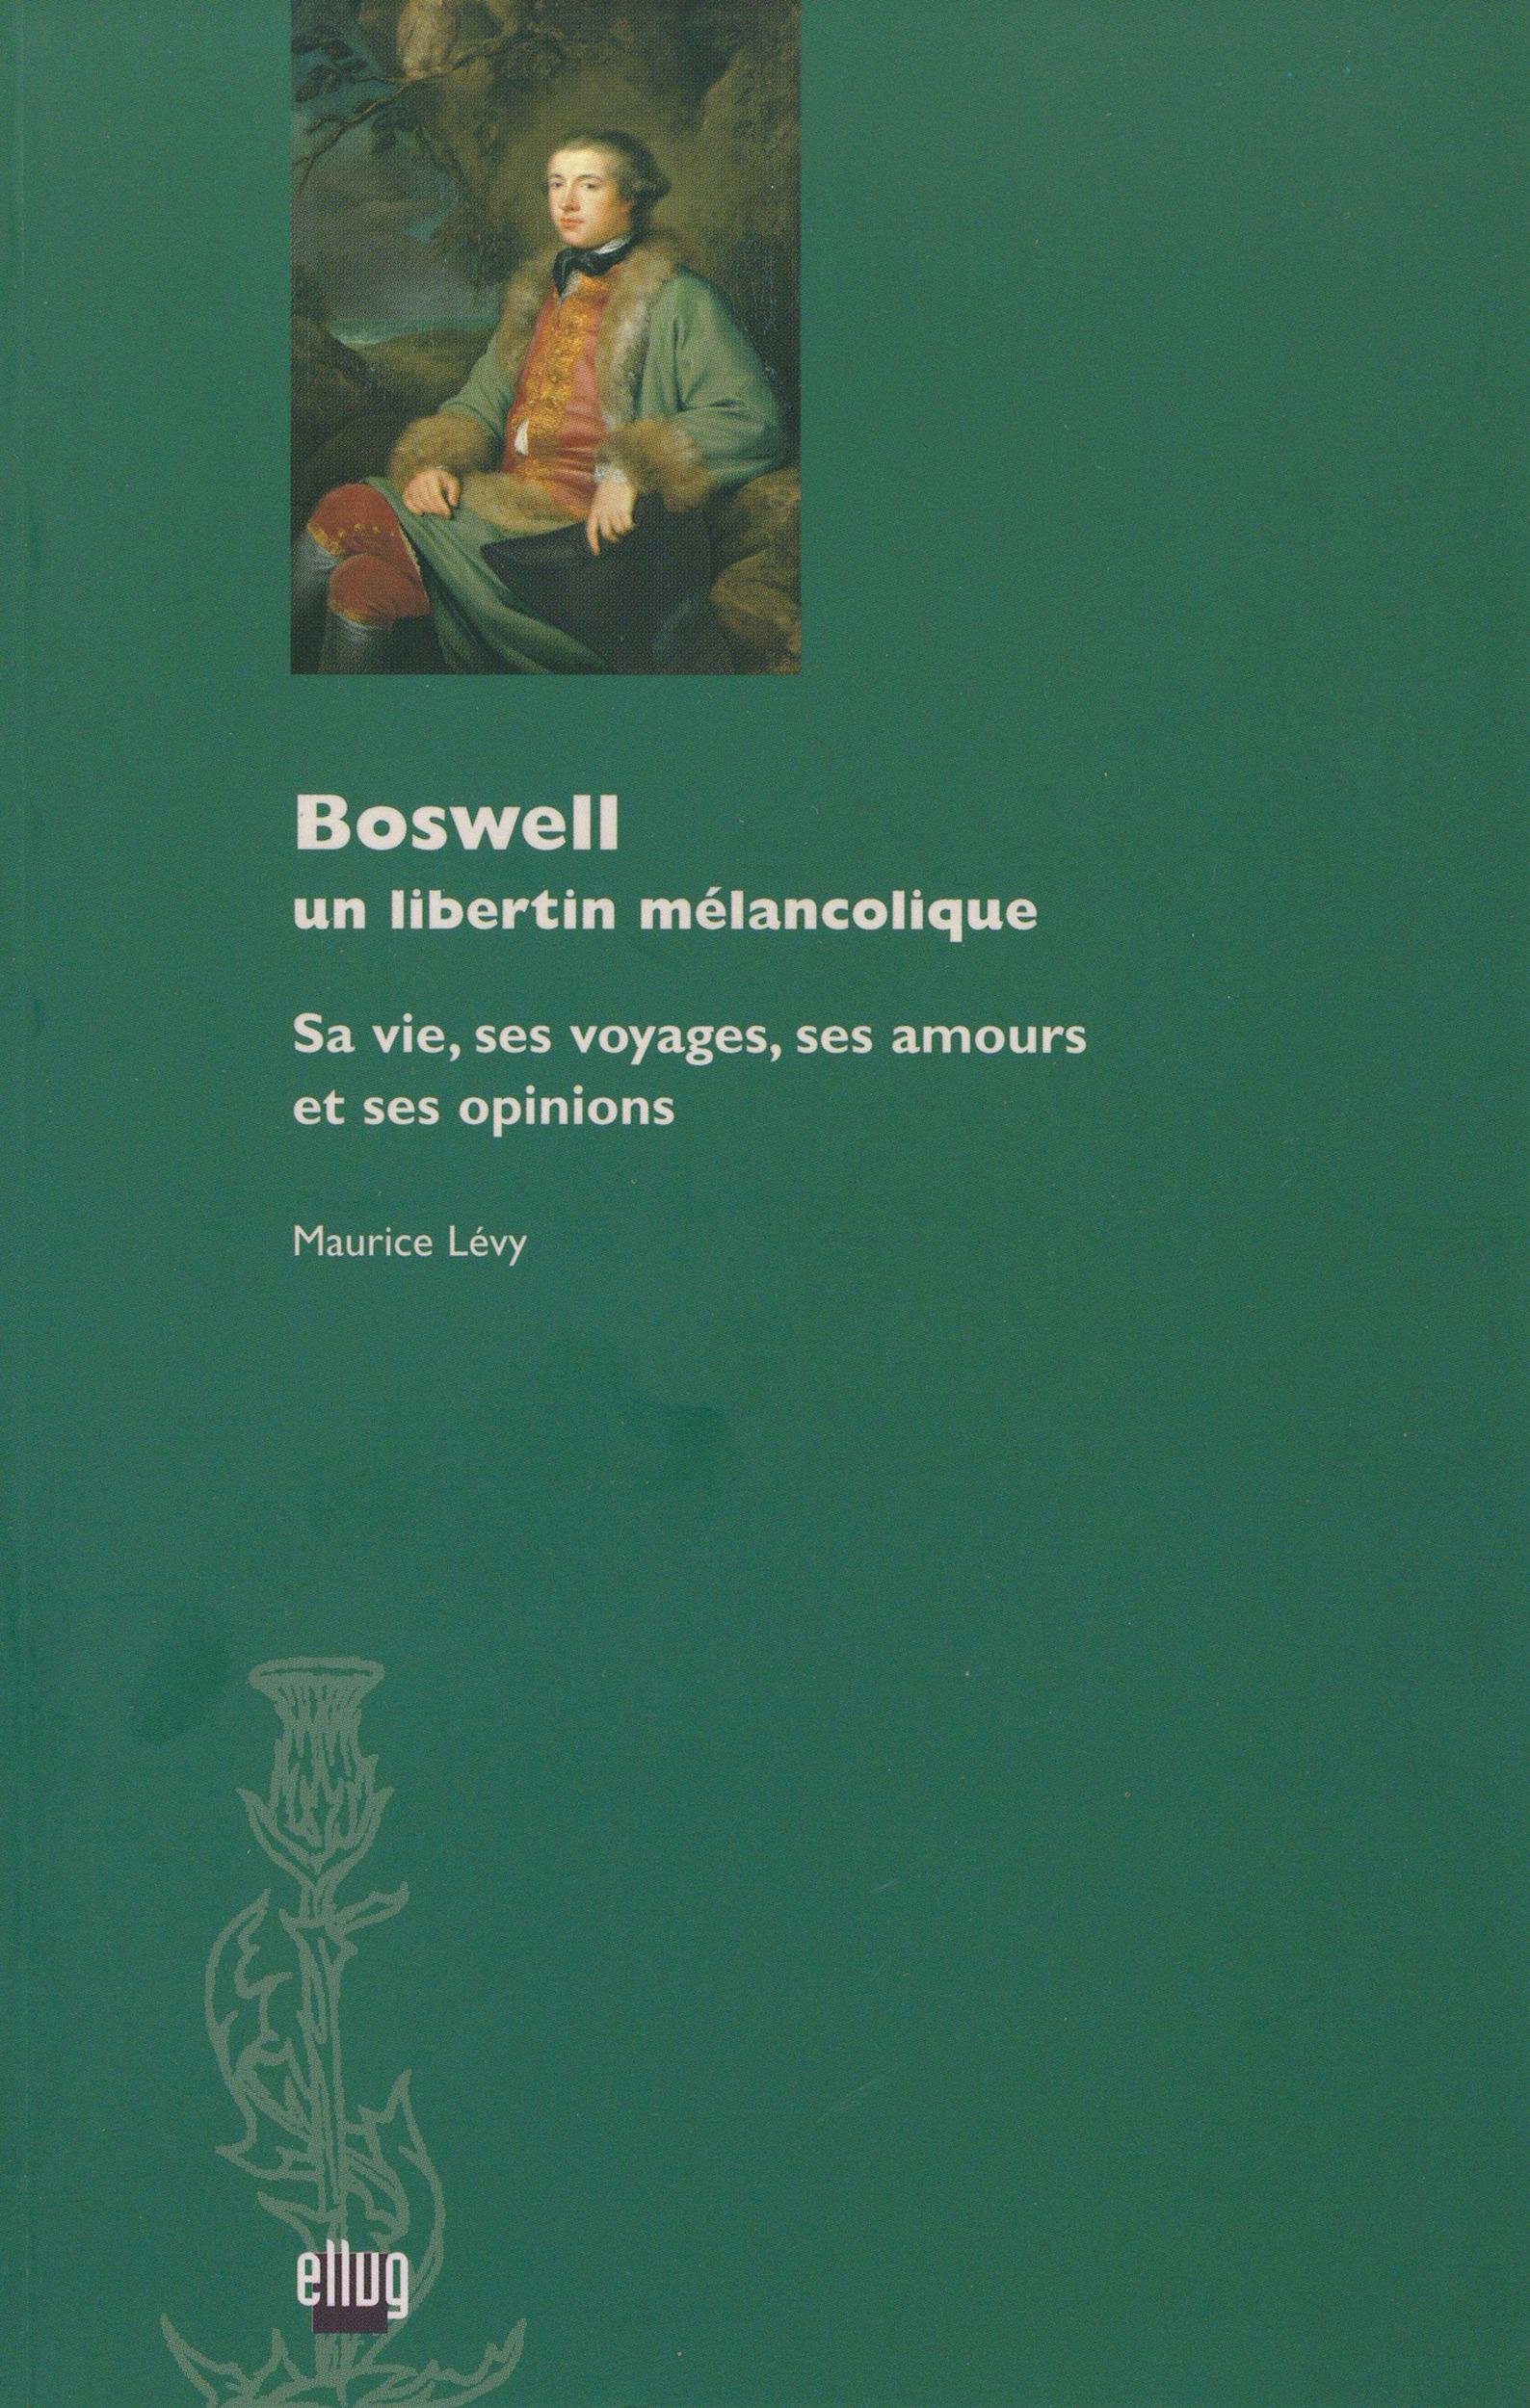 Boswell, un libertin mélancolique  - Maurice Lévy